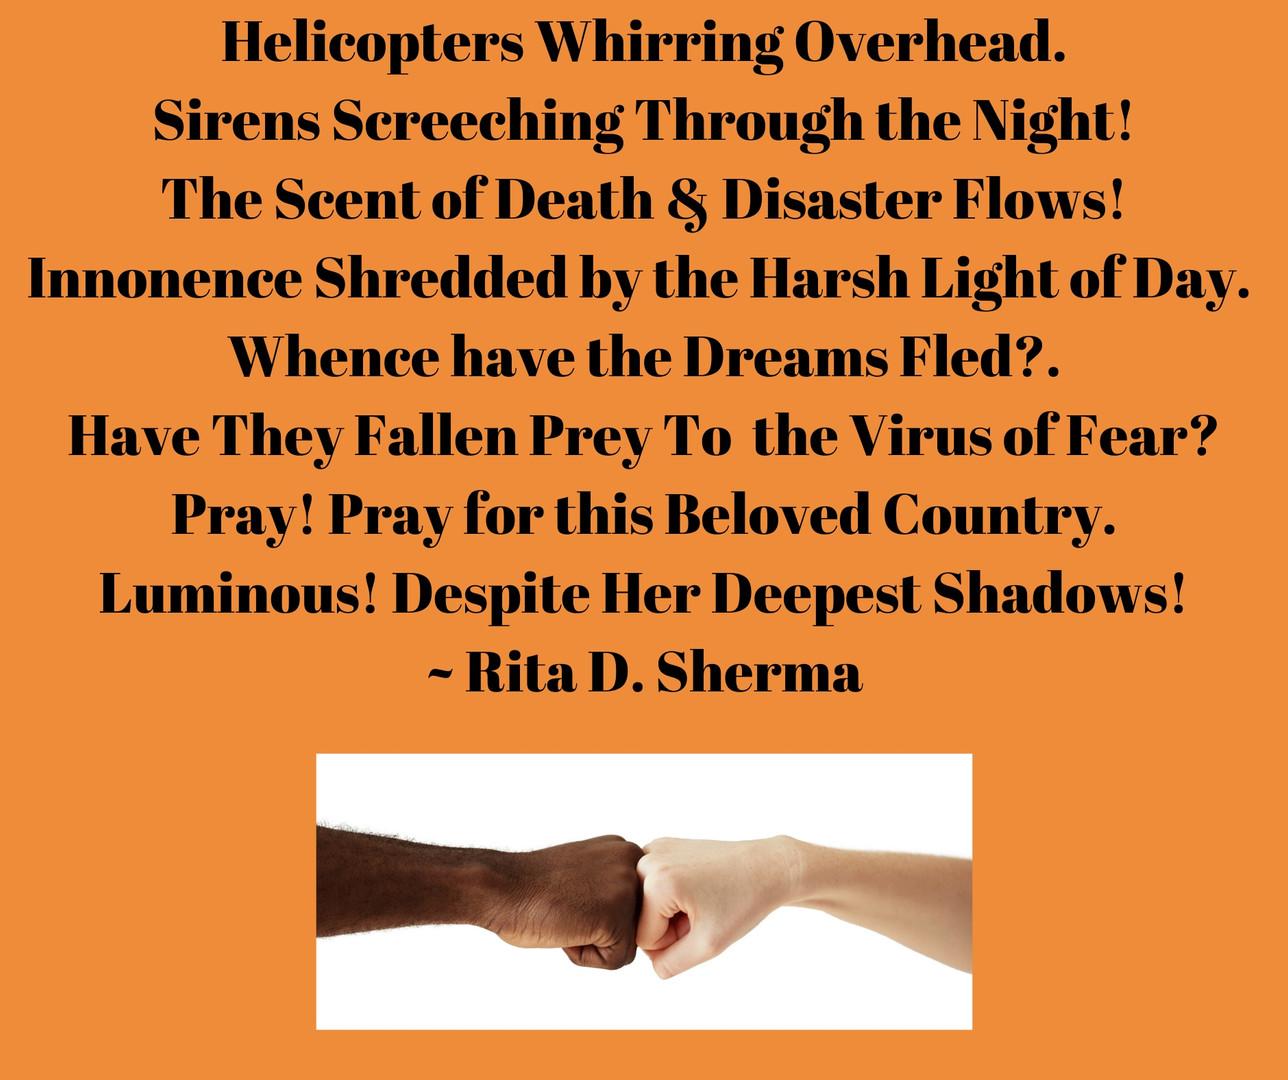 Poem by Rita D. Sherma